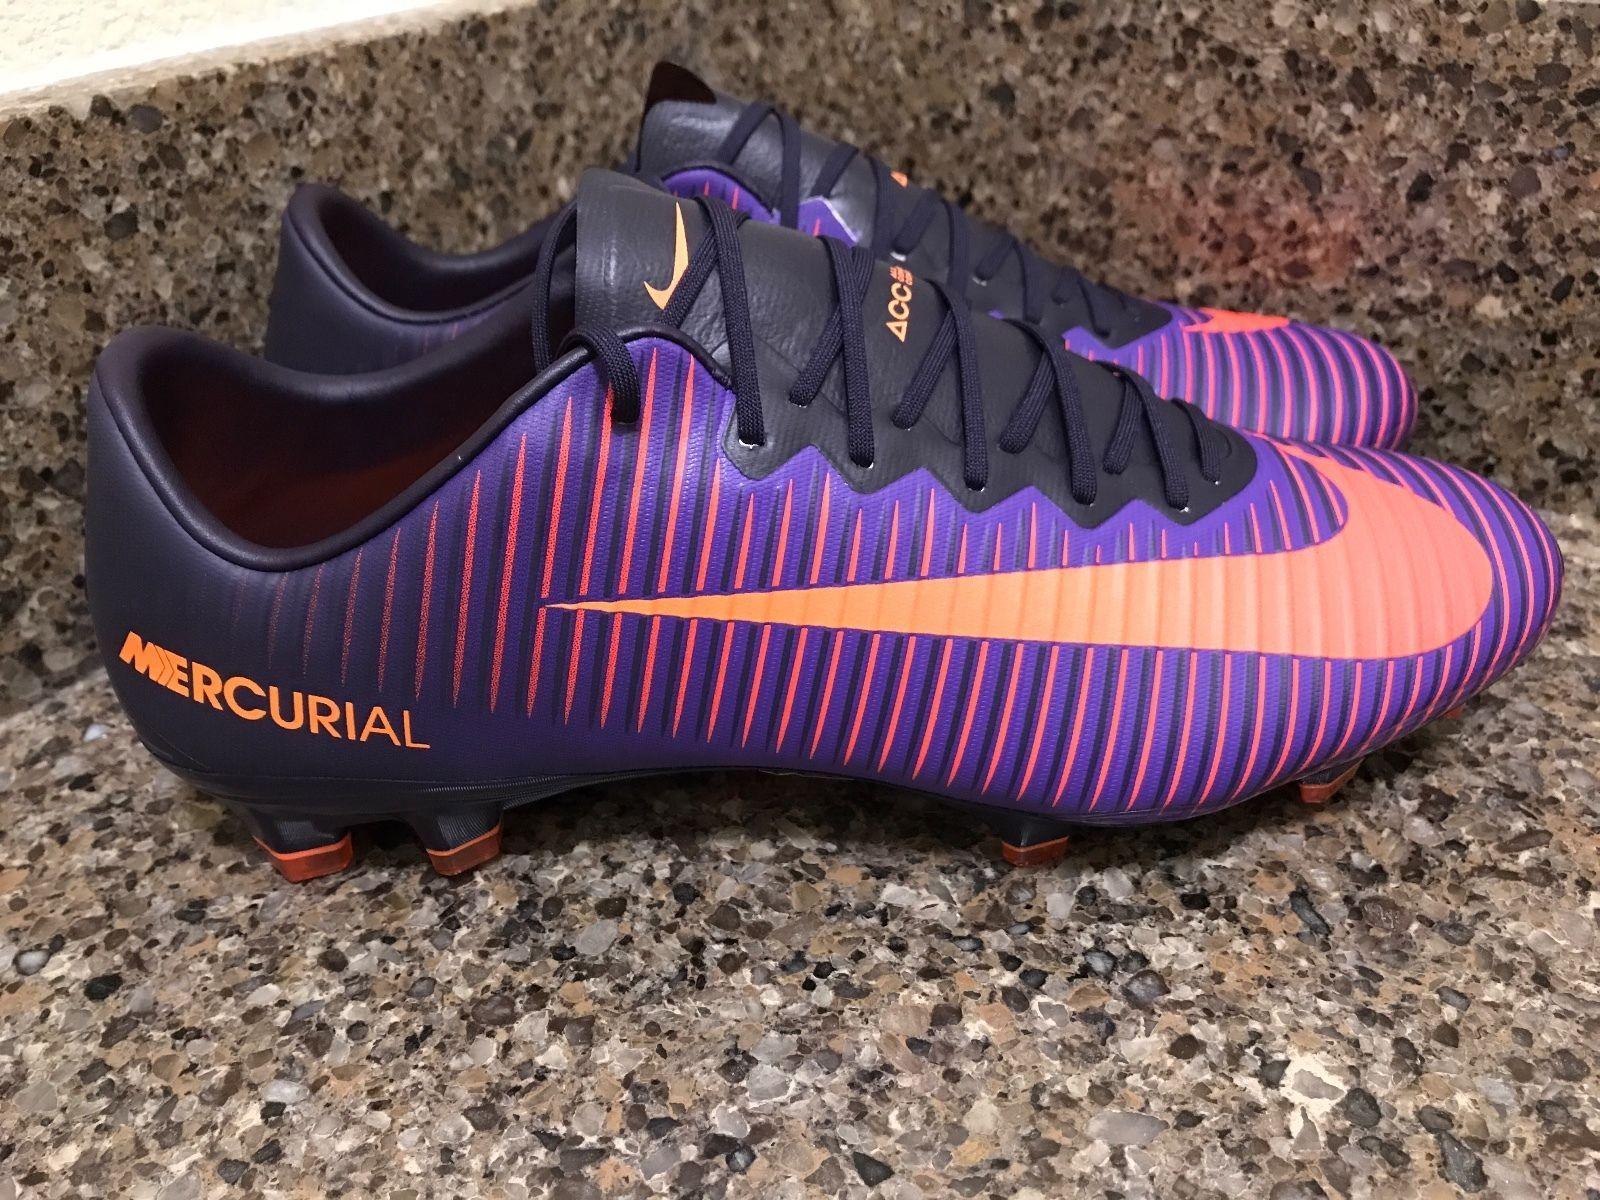 Nike Mercurial Vapor Xi Fg Acc Purple Dynasty 831958 585 Men Sz 10 11 12 13 In 2020